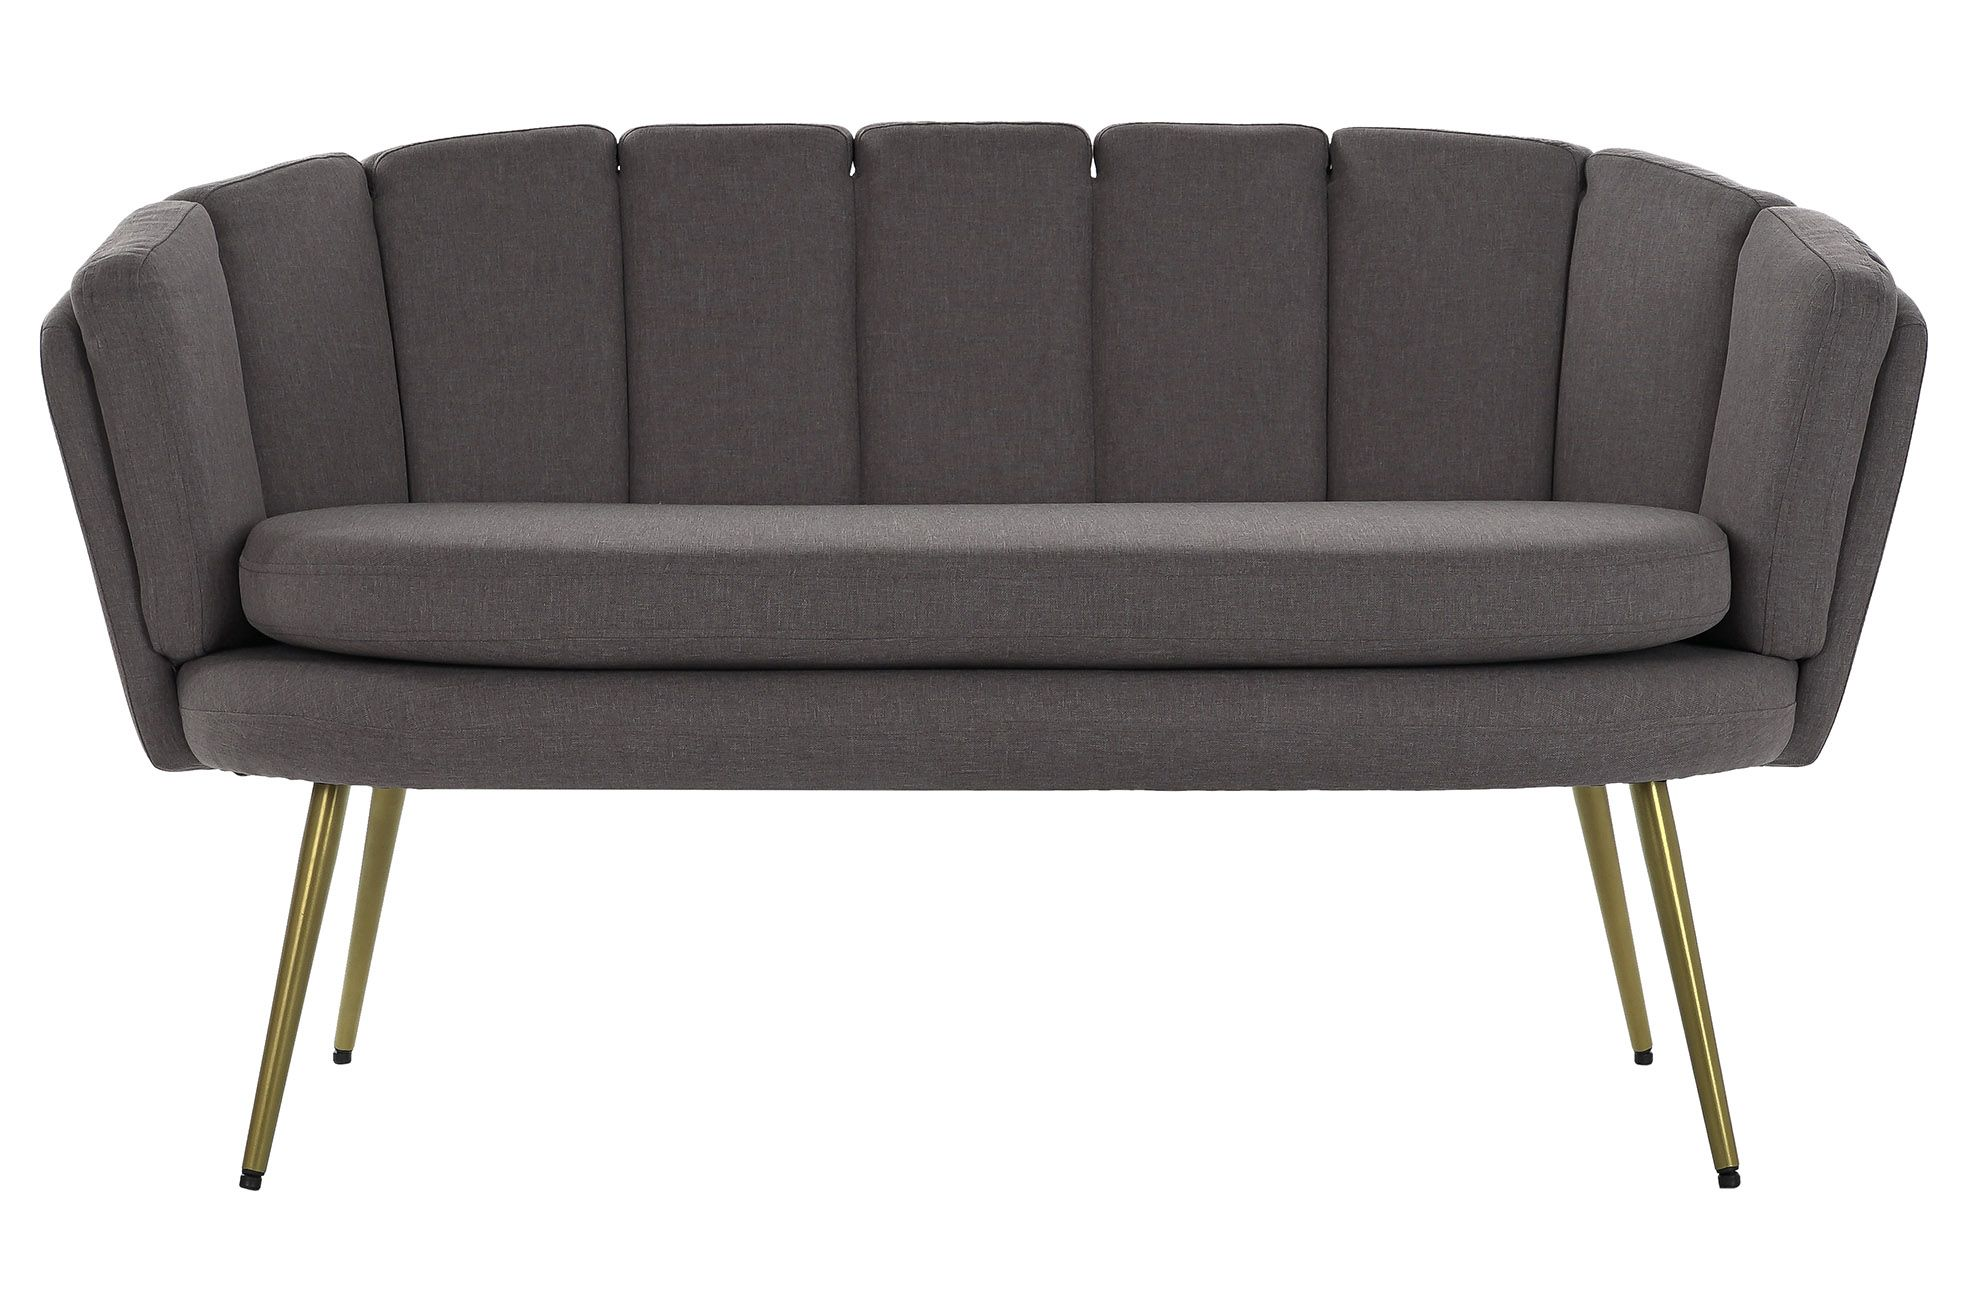 31810-sofa-scandi-deco-2p-1.jpg